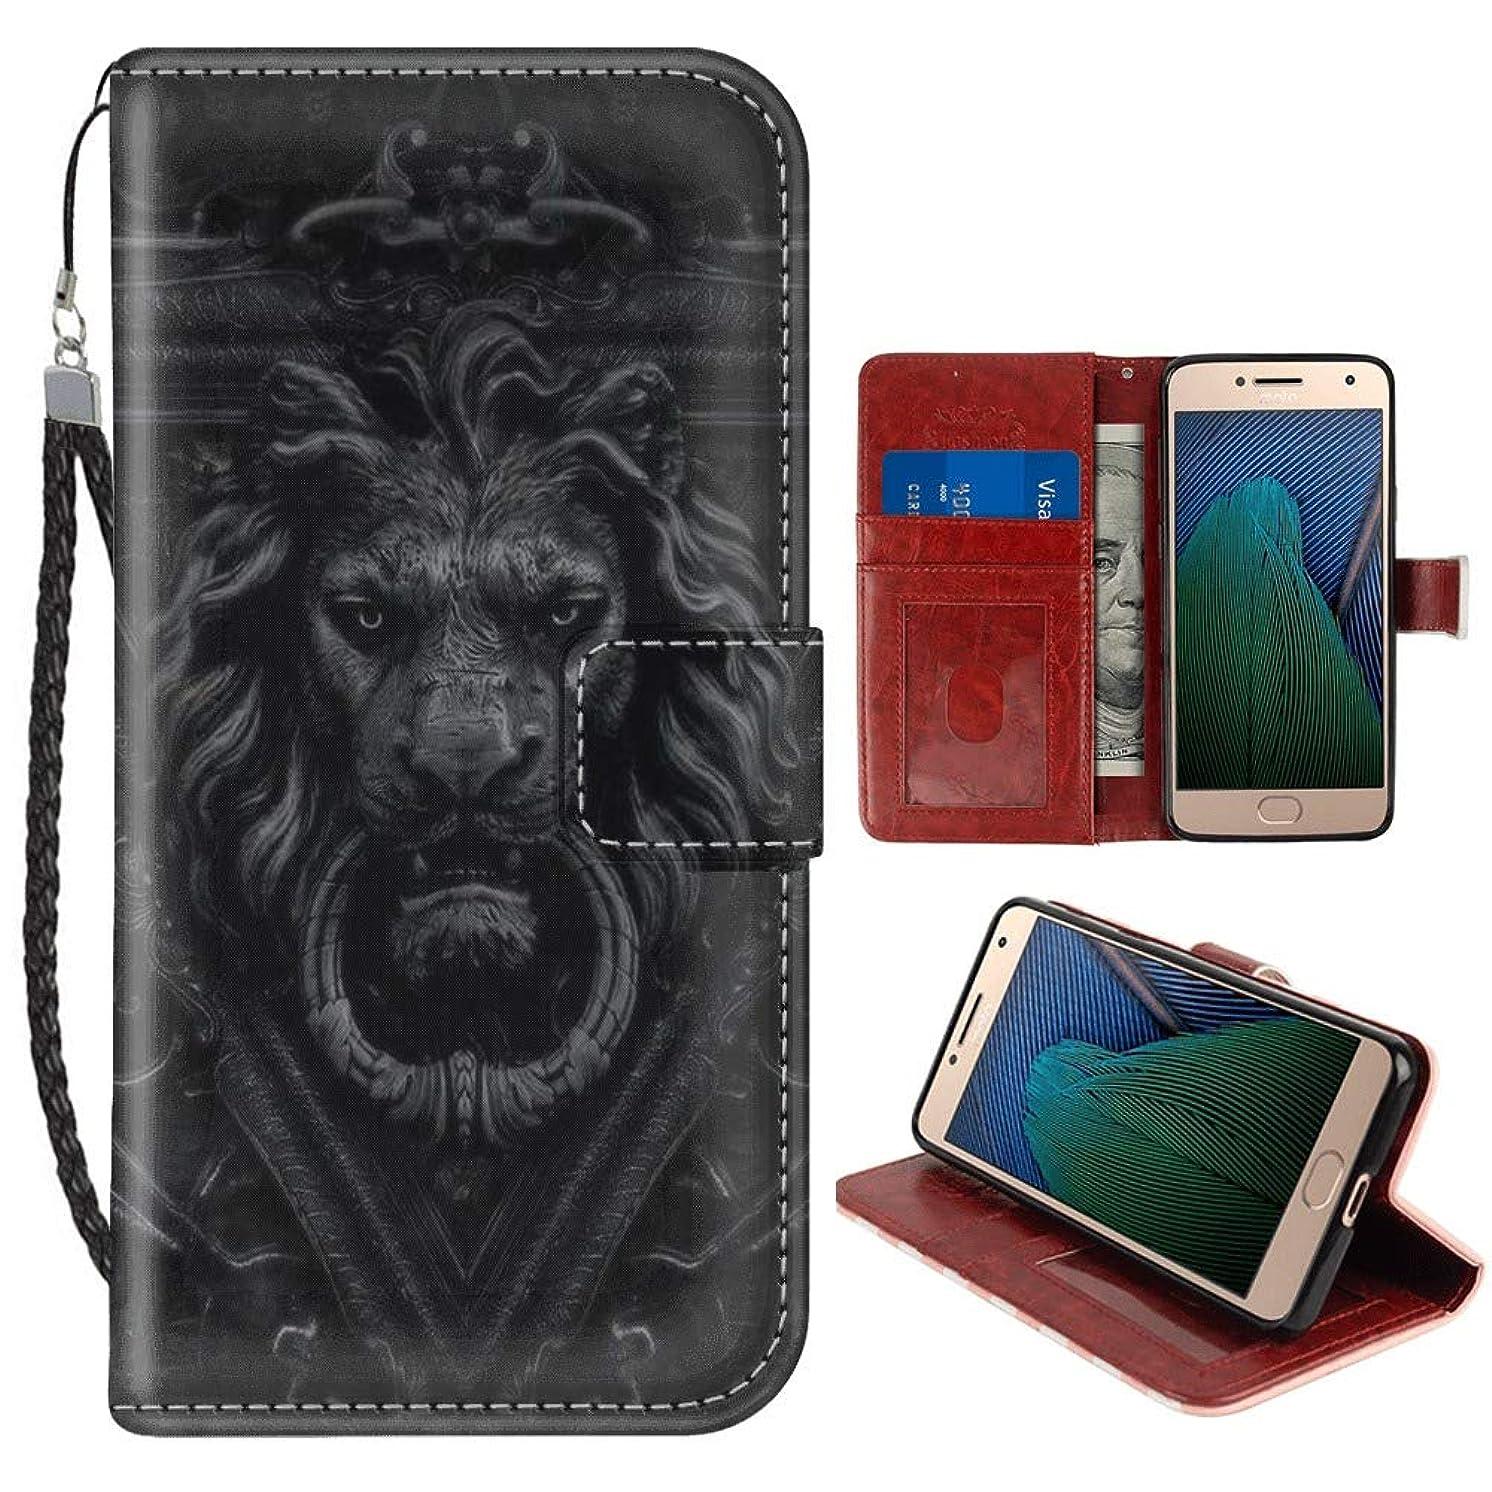 SITUOLI Lion Door Handle Moto G5 Plus Wallet Case Wrist Strap Standable Kickstand PU Leather Card Holder Phone Case for Moto G5 Plus